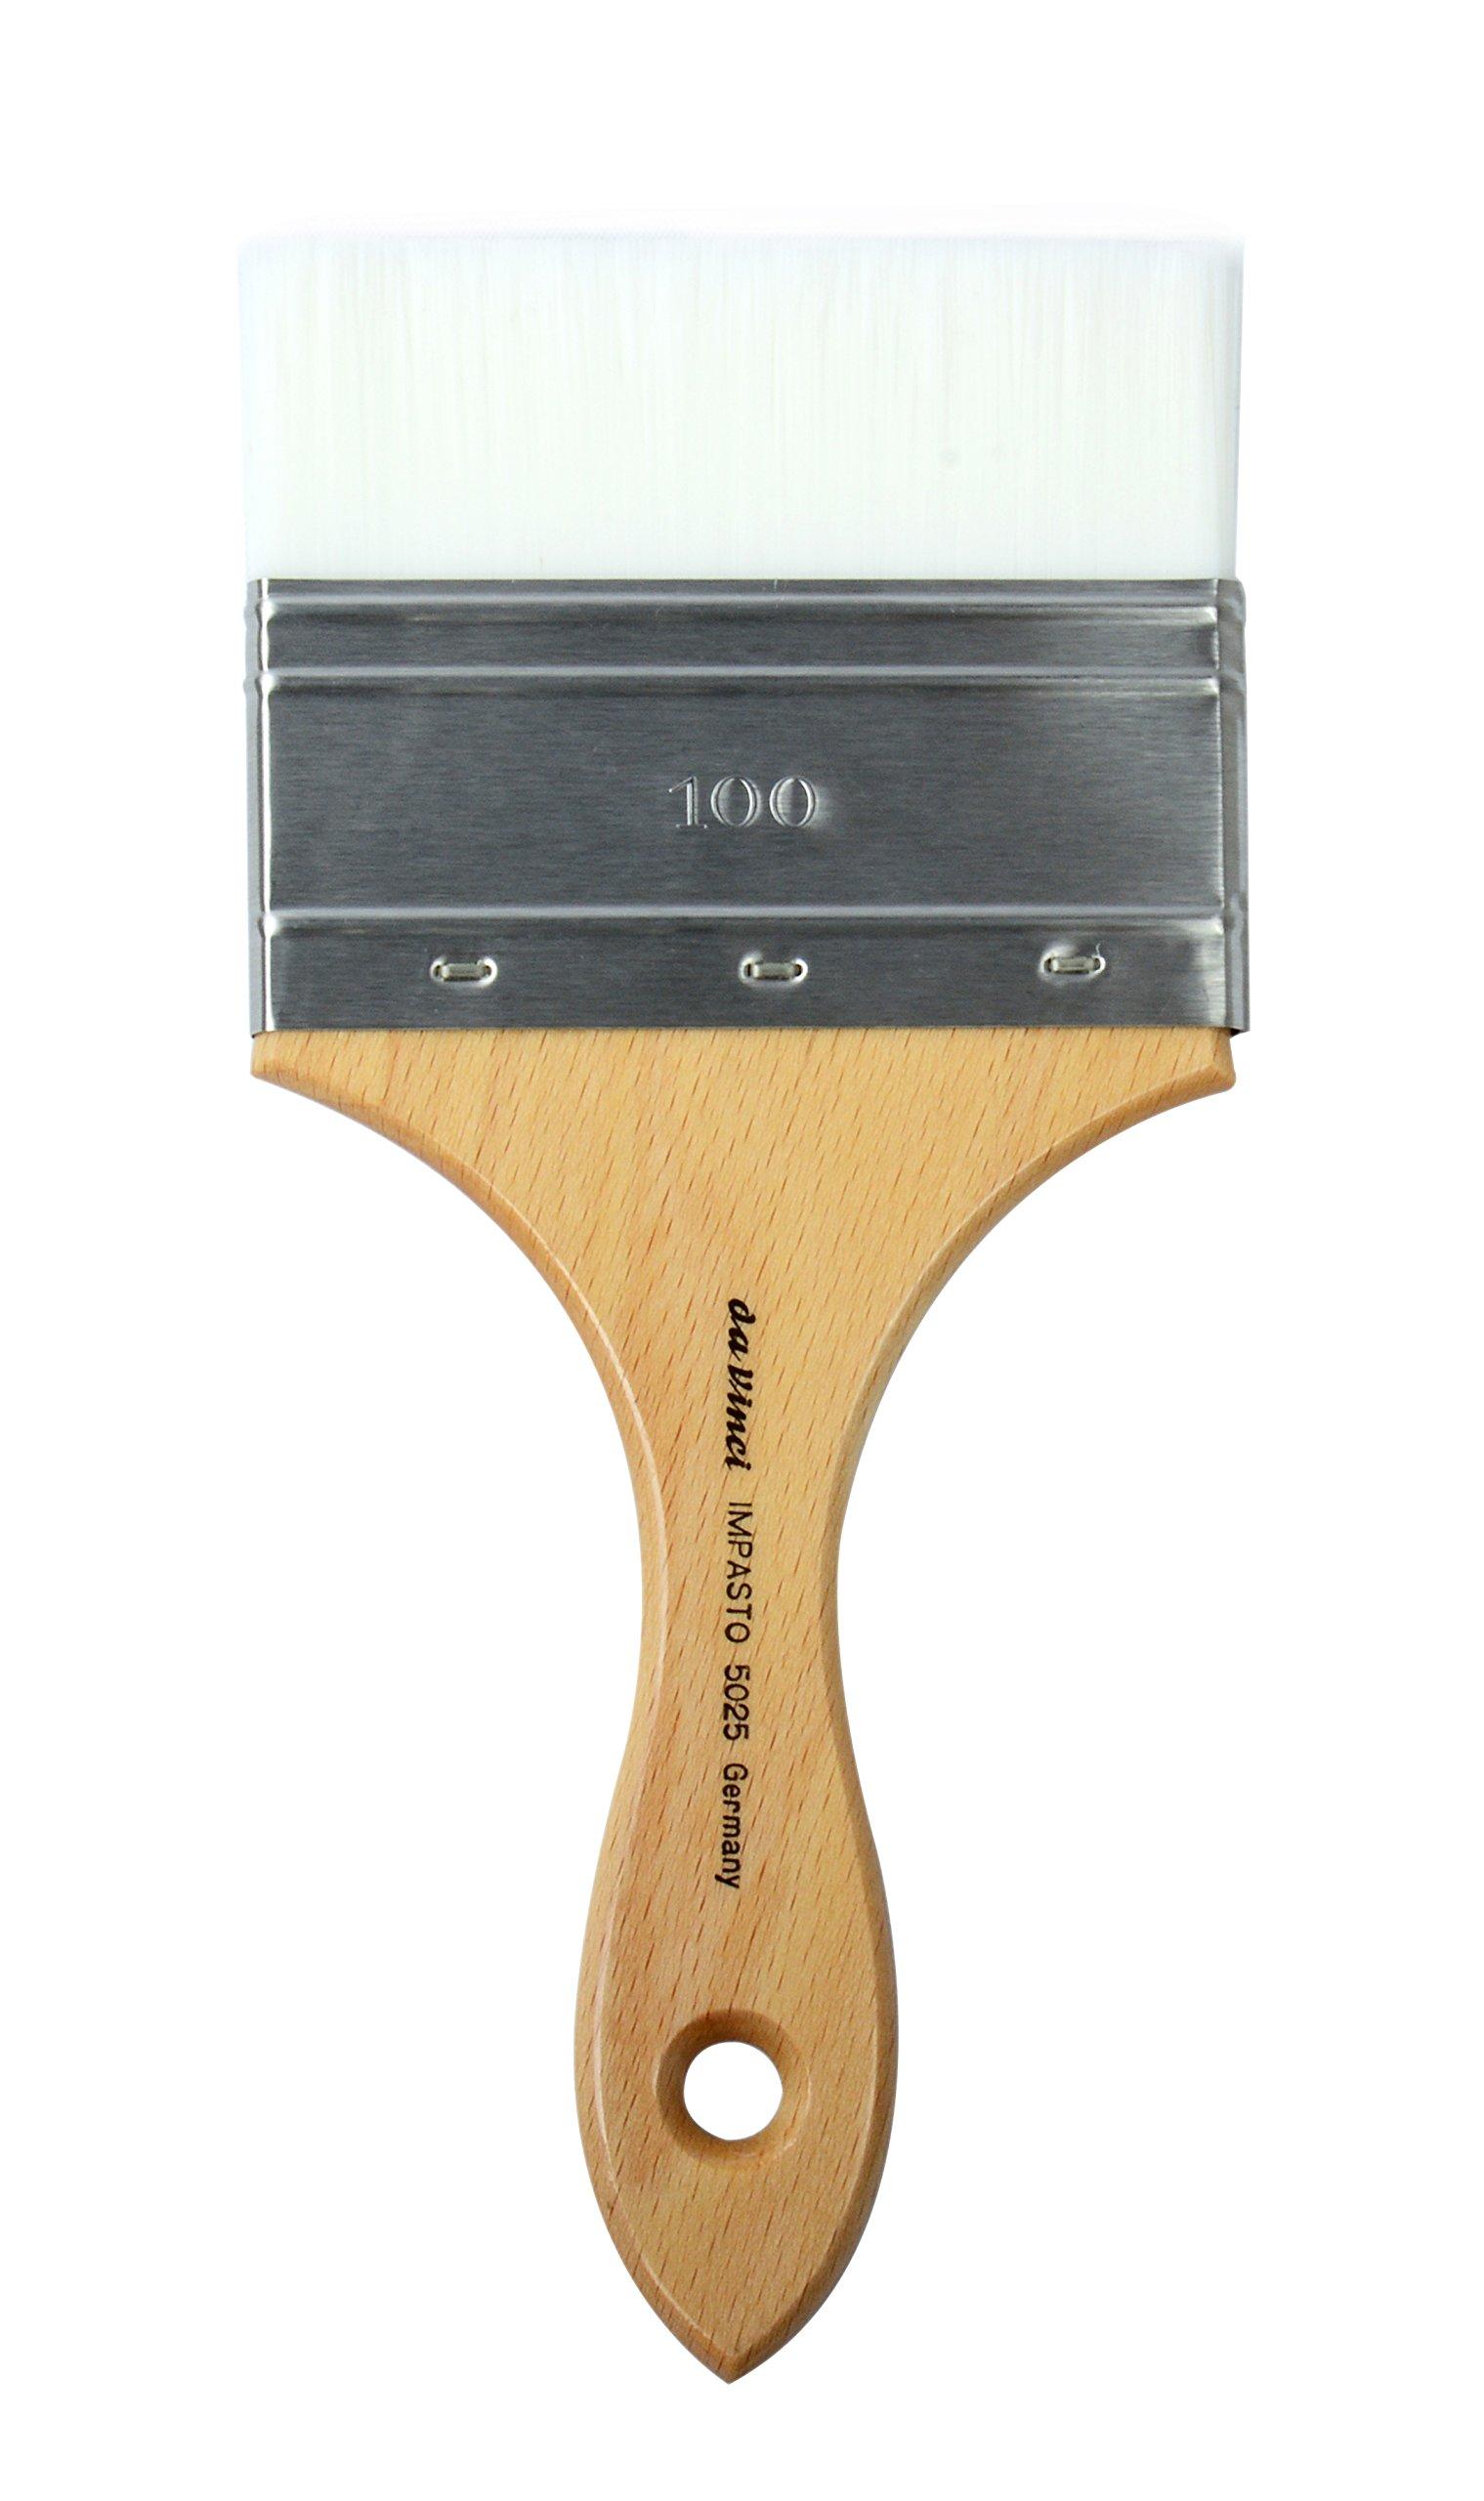 da Vinci Oil & Acrylic Series 5025 Impasto Paint Brush, Mottler Extra Stiff White Synthetic, Size 100